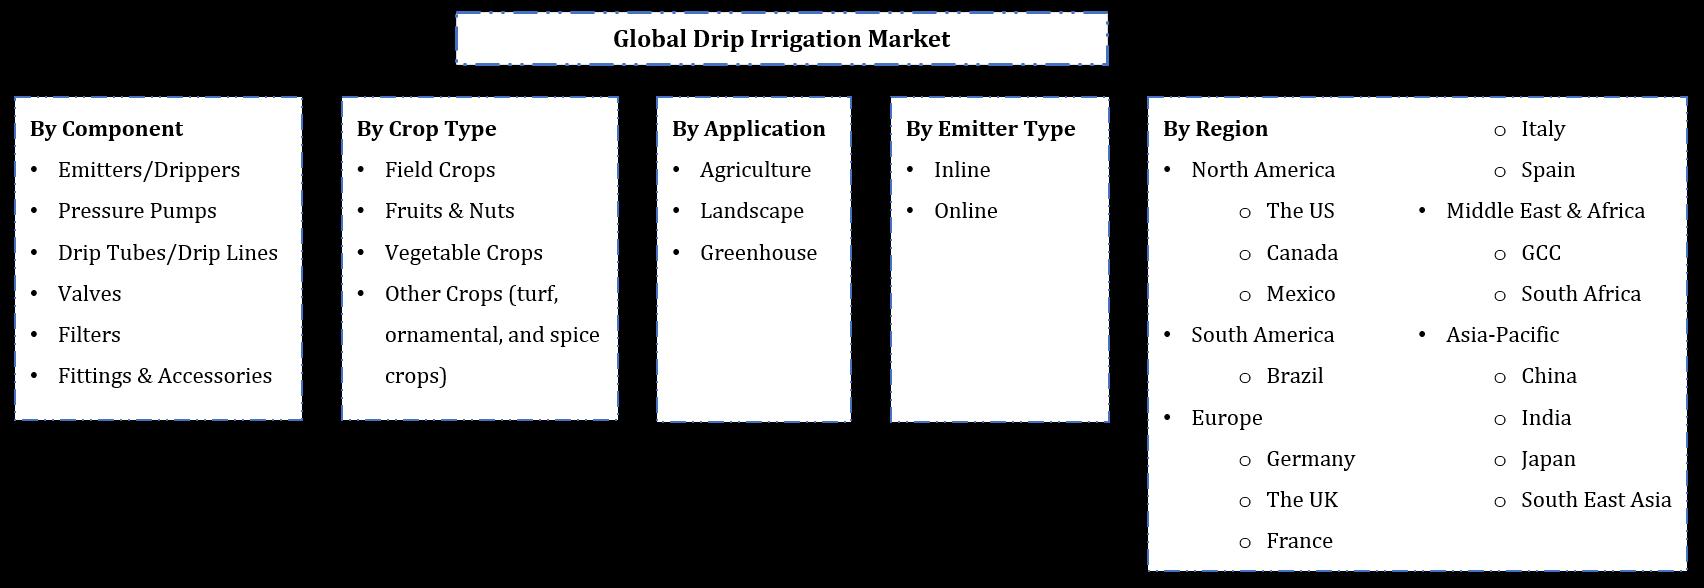 Global Drip Irrigation Market Segmentation